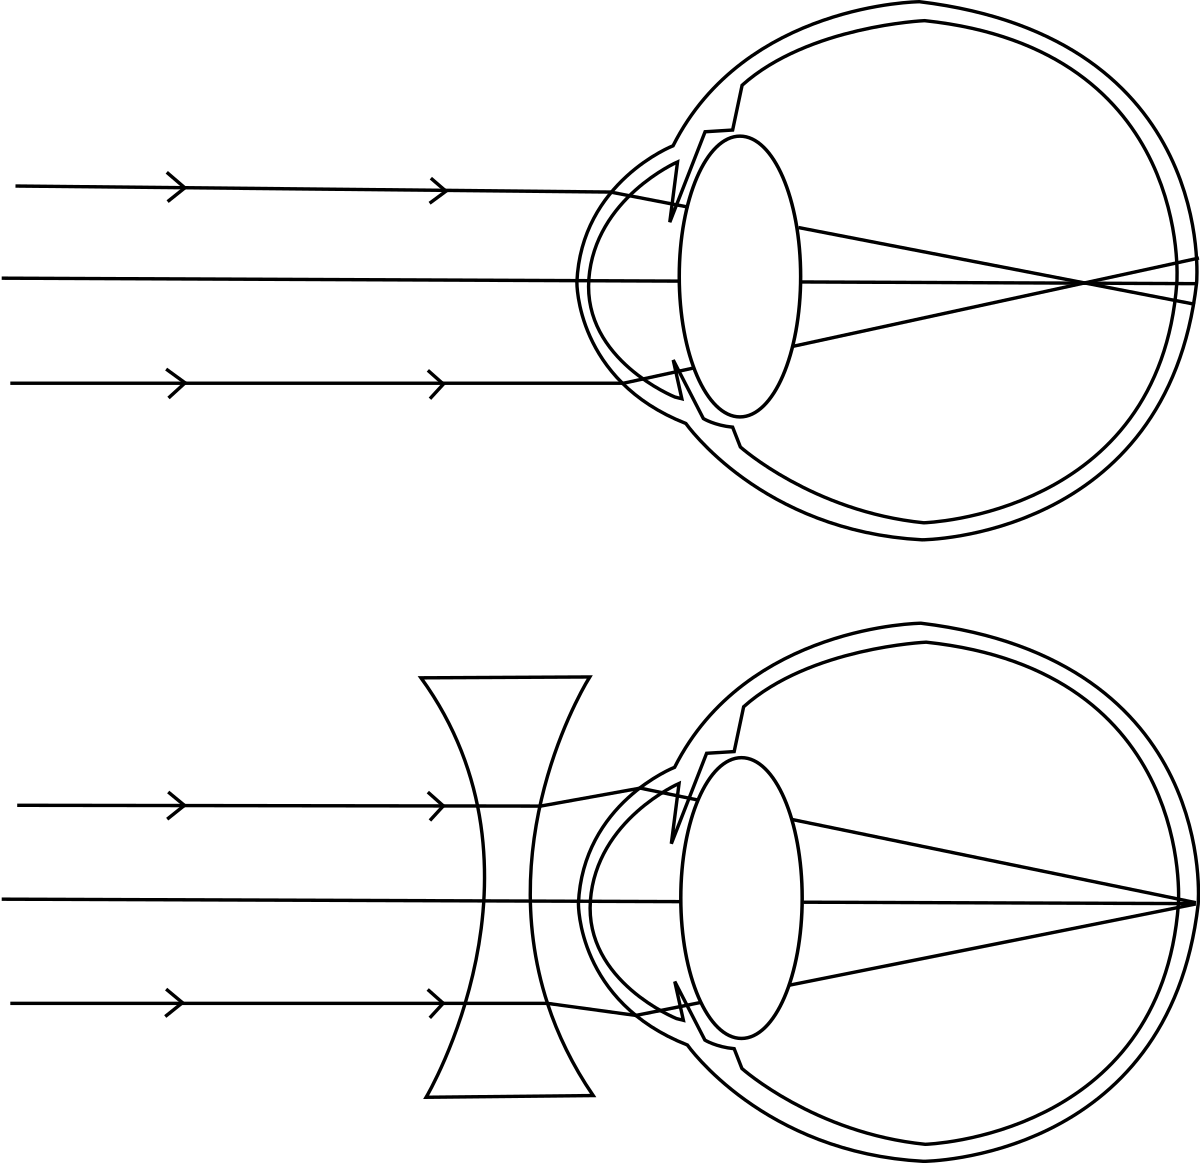 diagrama miopiei vindecați exercițiul vizual